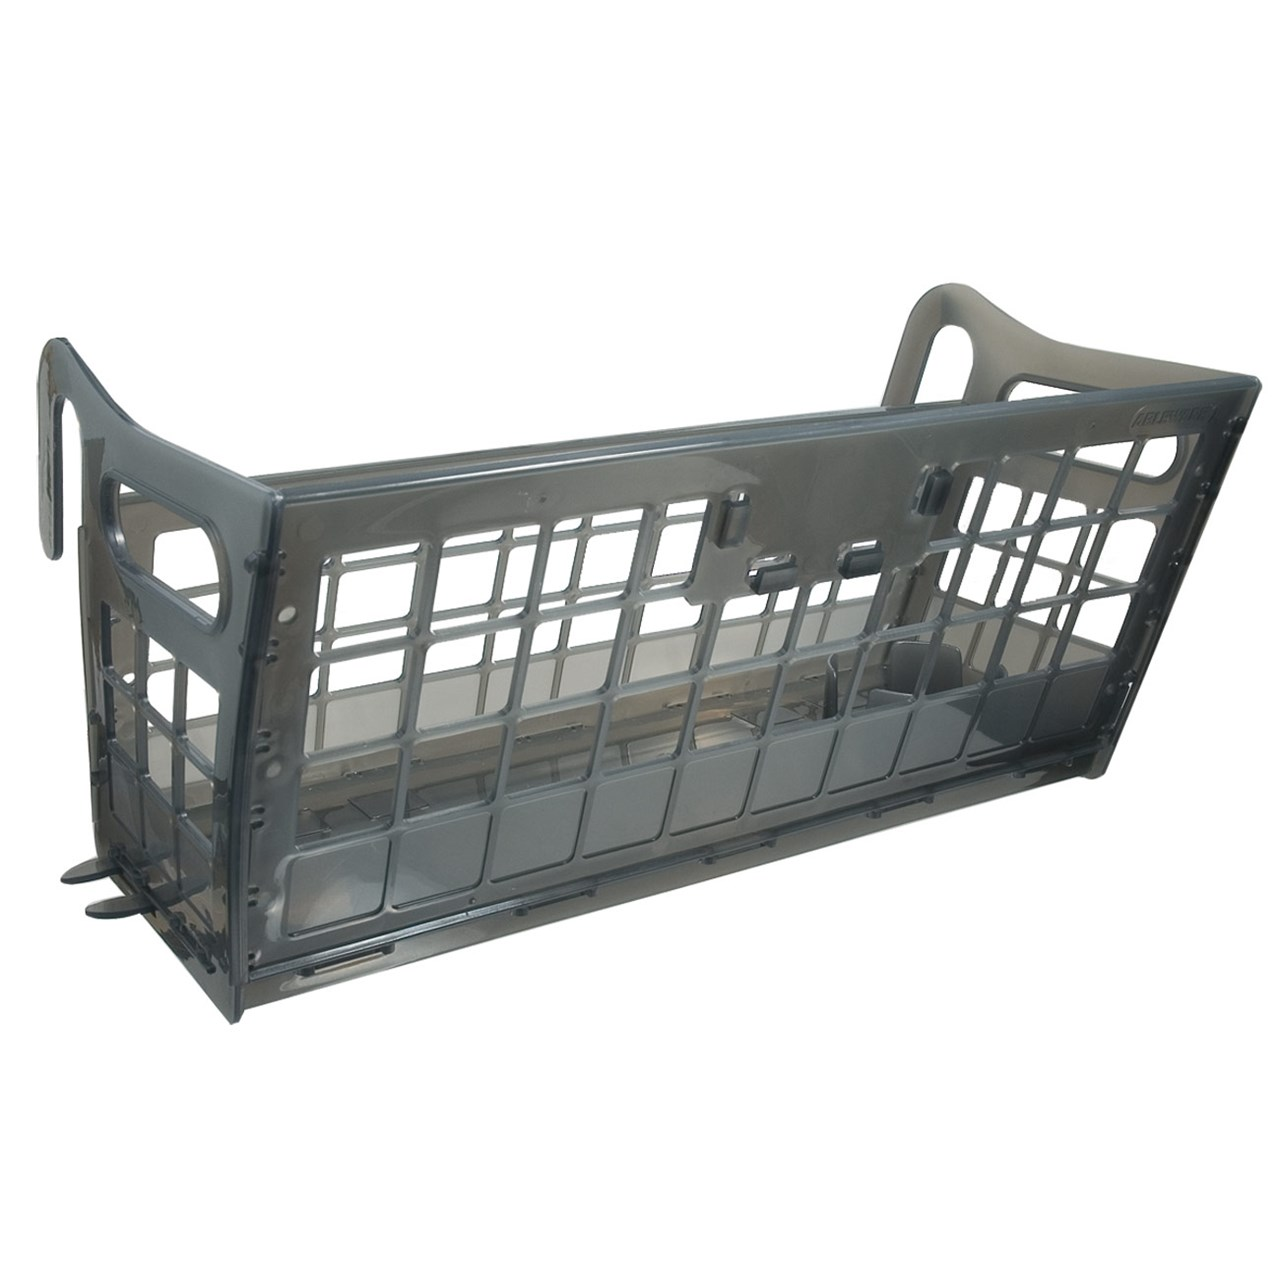 MaxiAids | No-Wire Walker Basket